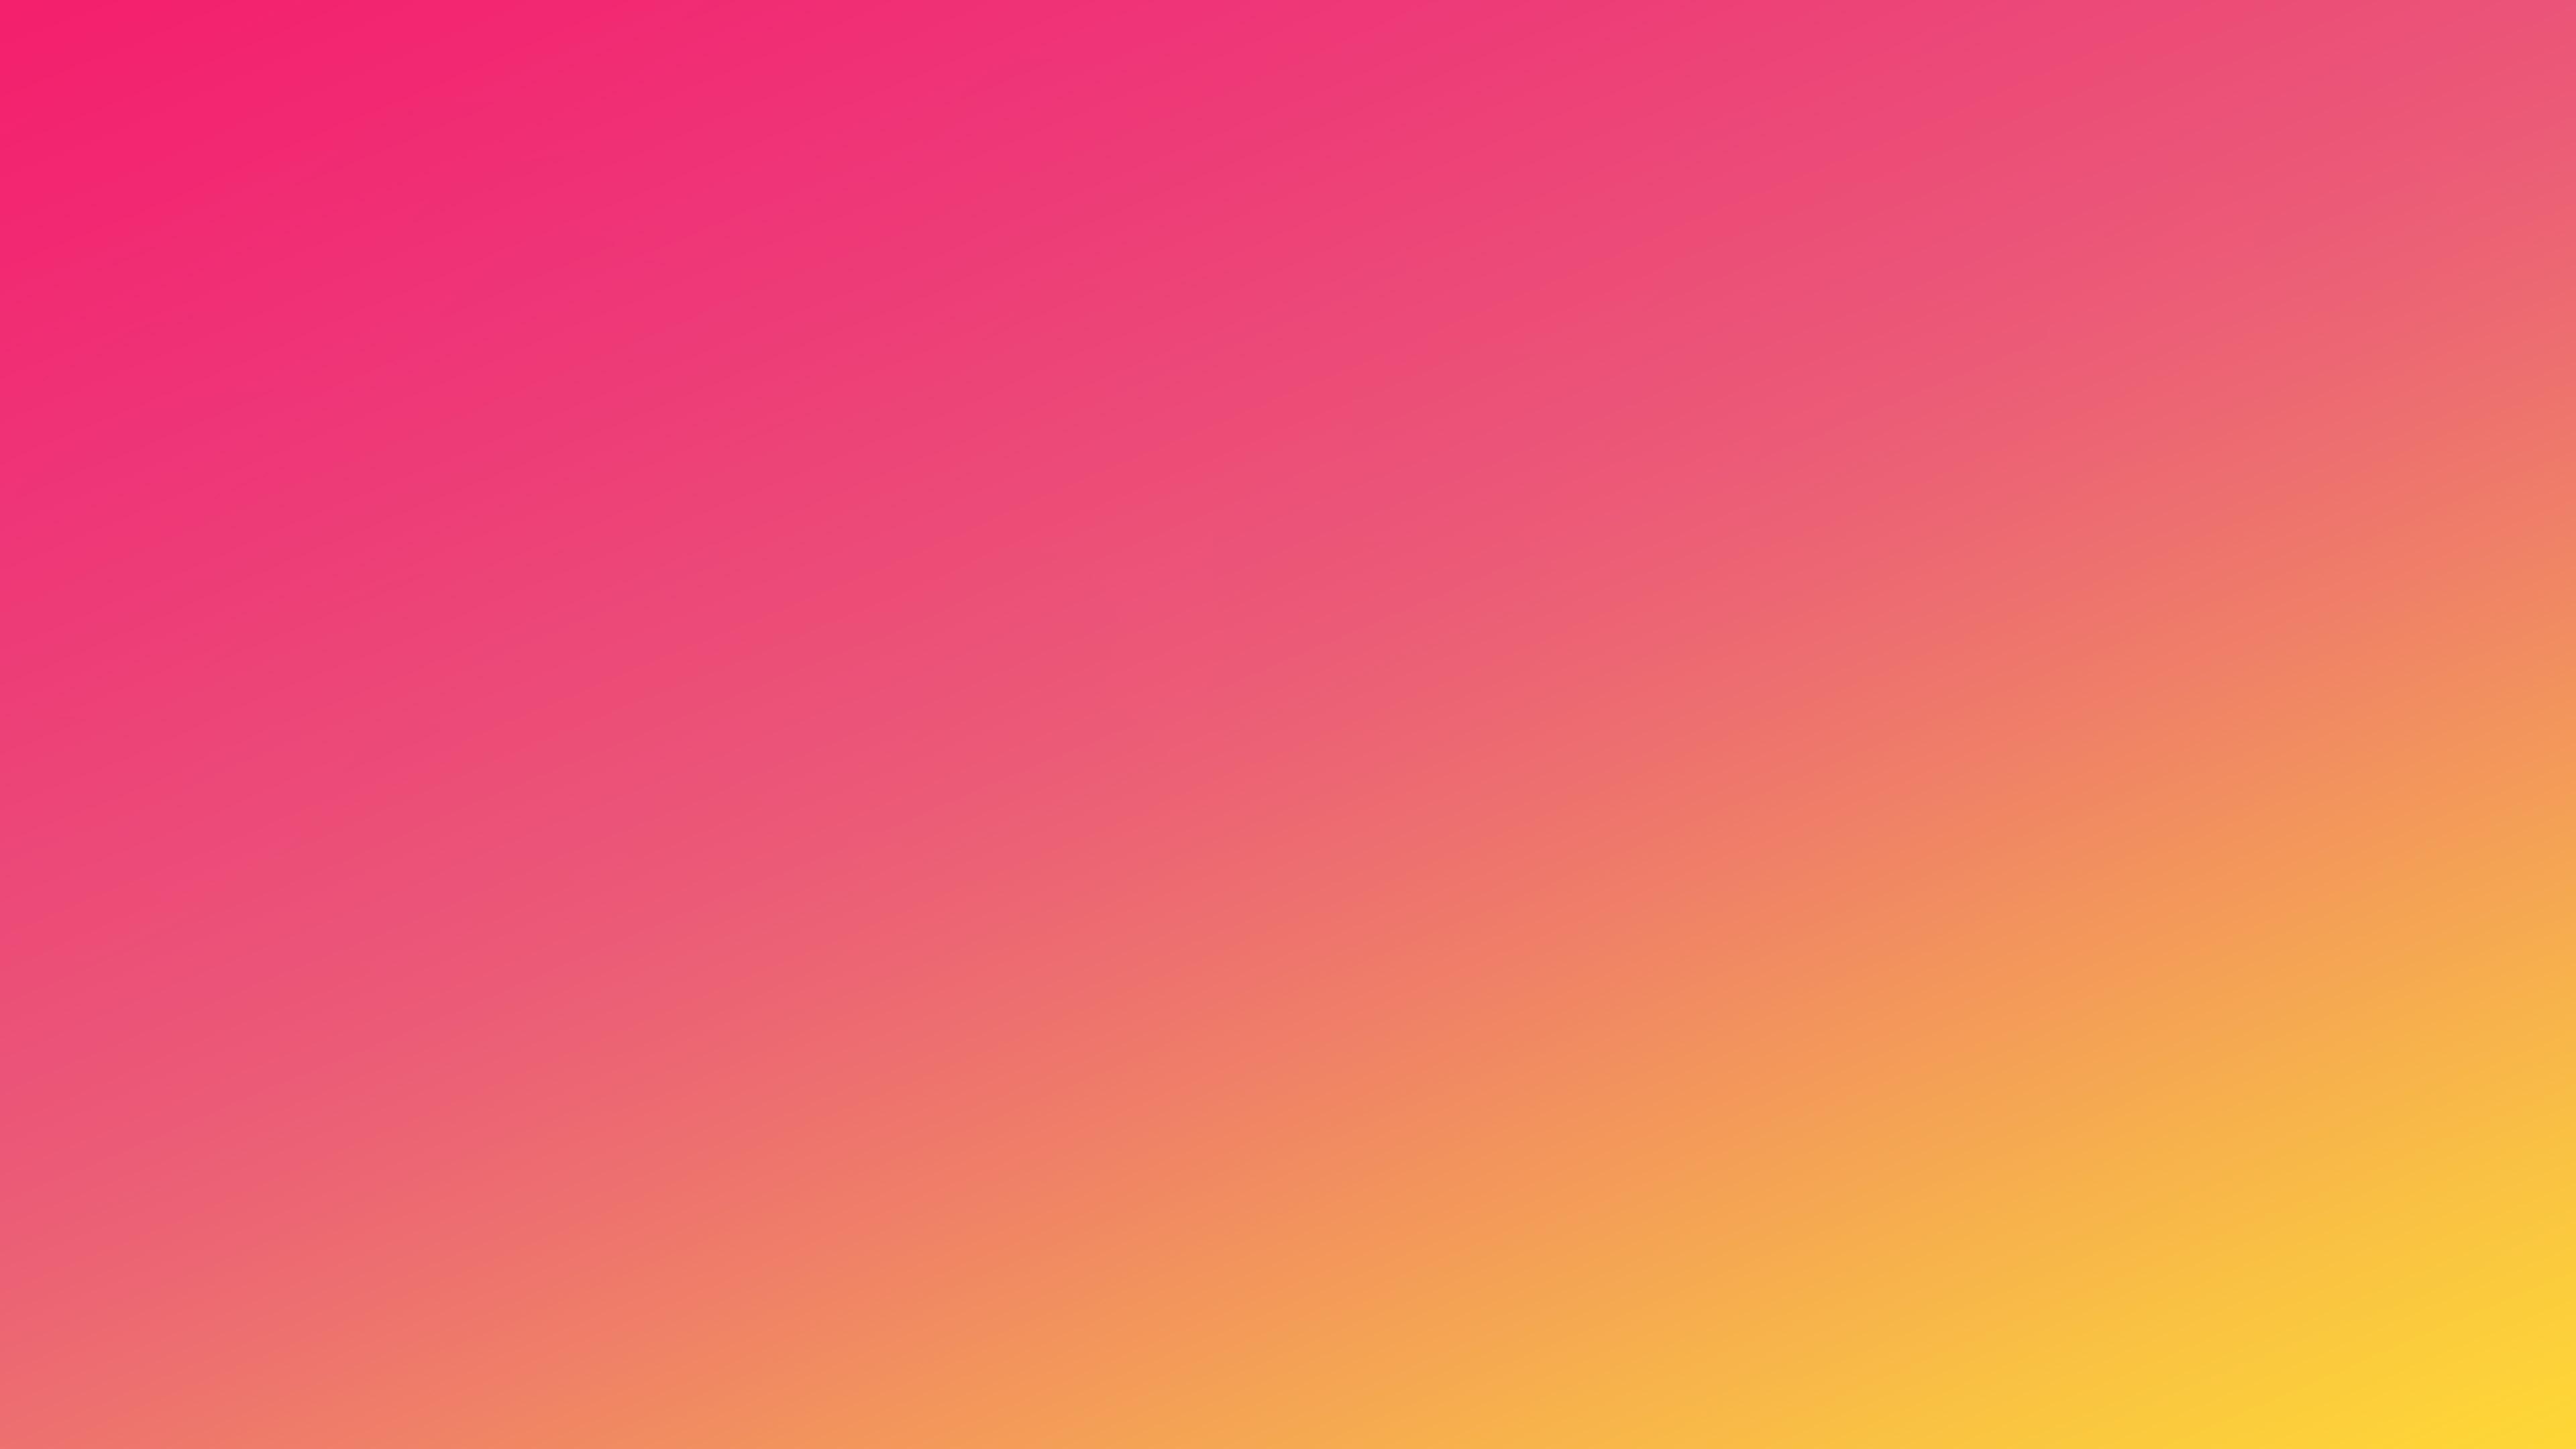 sl78-red-yellow-summer-blur-gradation-wallpaper